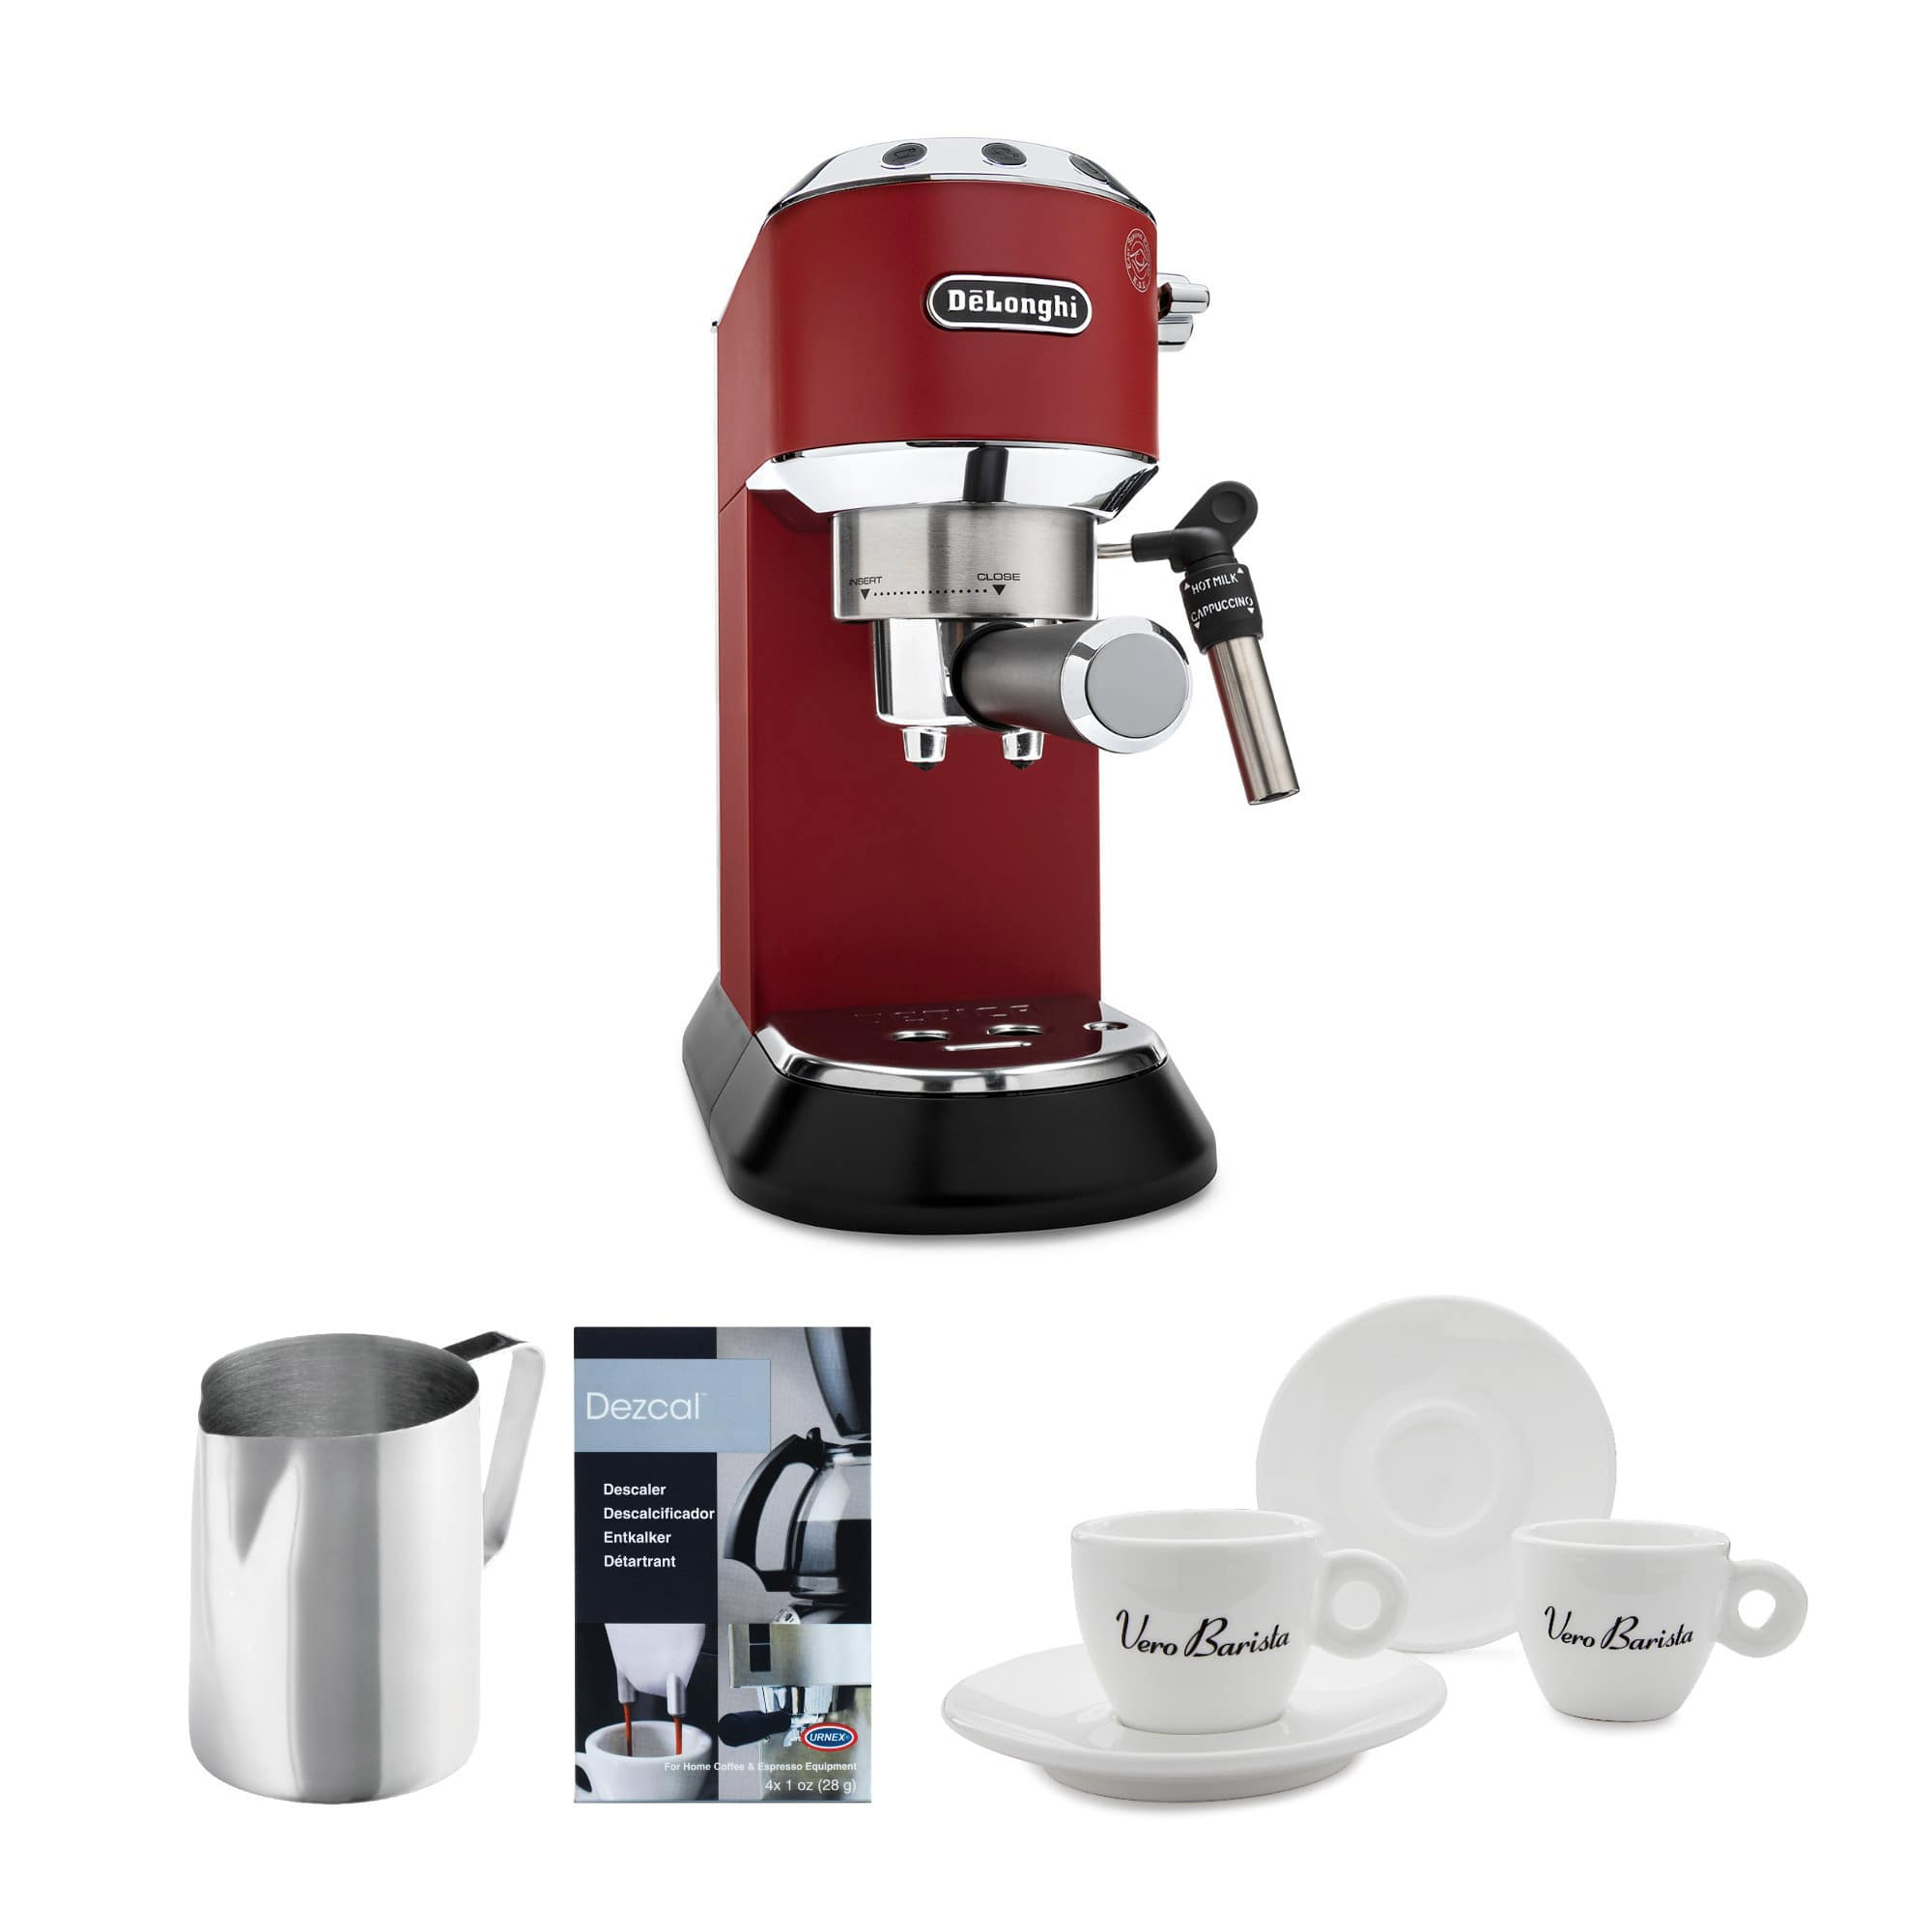 DeLonghi Dedica Deluxe 15-Bar Pump Espresso Machine EC685R  $245 + Free Shipping